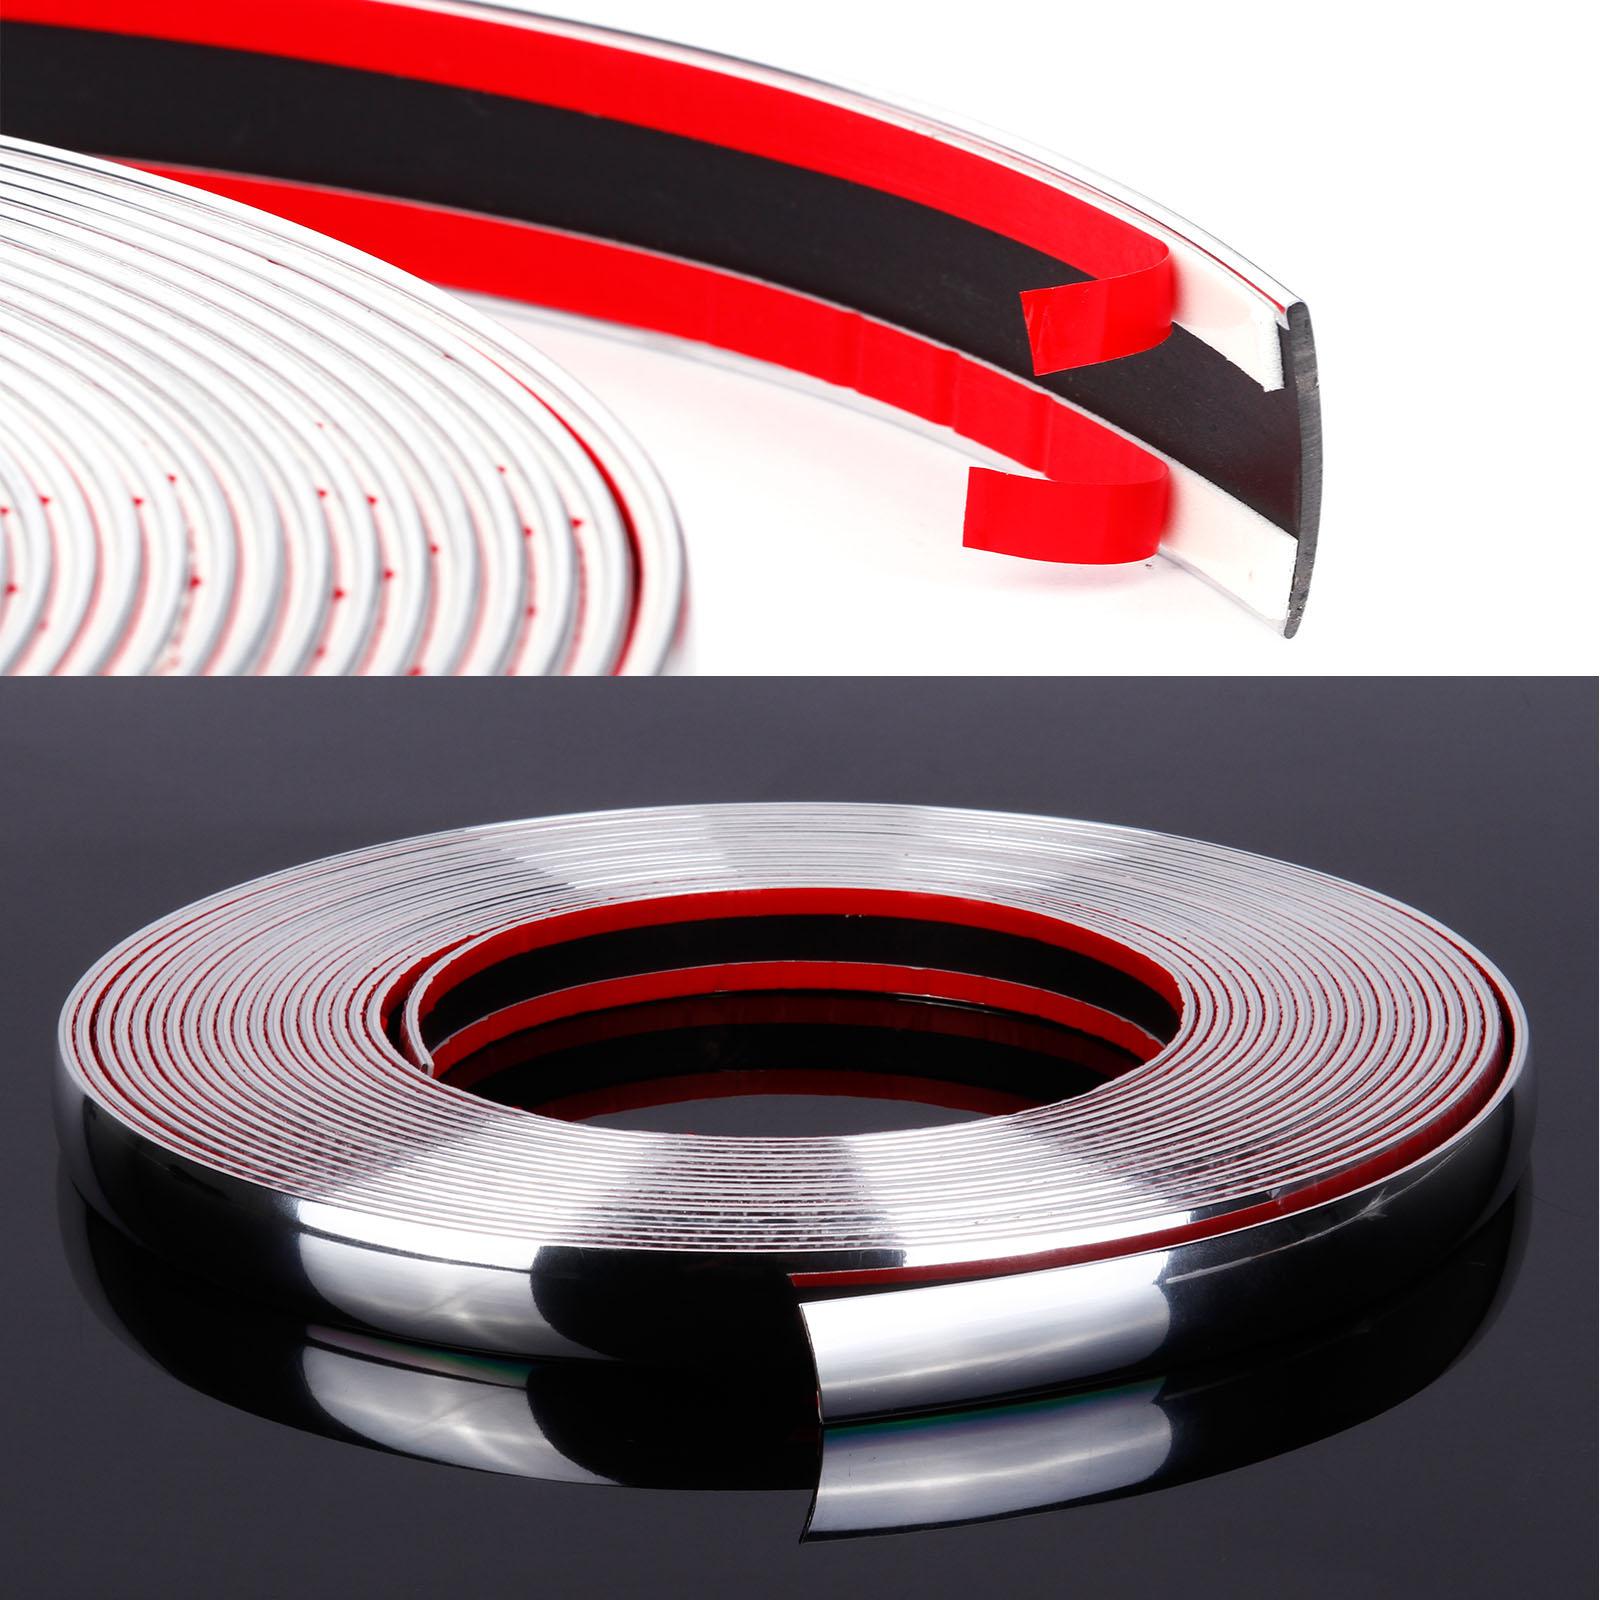 25mm x 5 meter Chrom Zierleiste Leisten Chromleiste Selbstklebend Flexibel Kunststoff Tuning